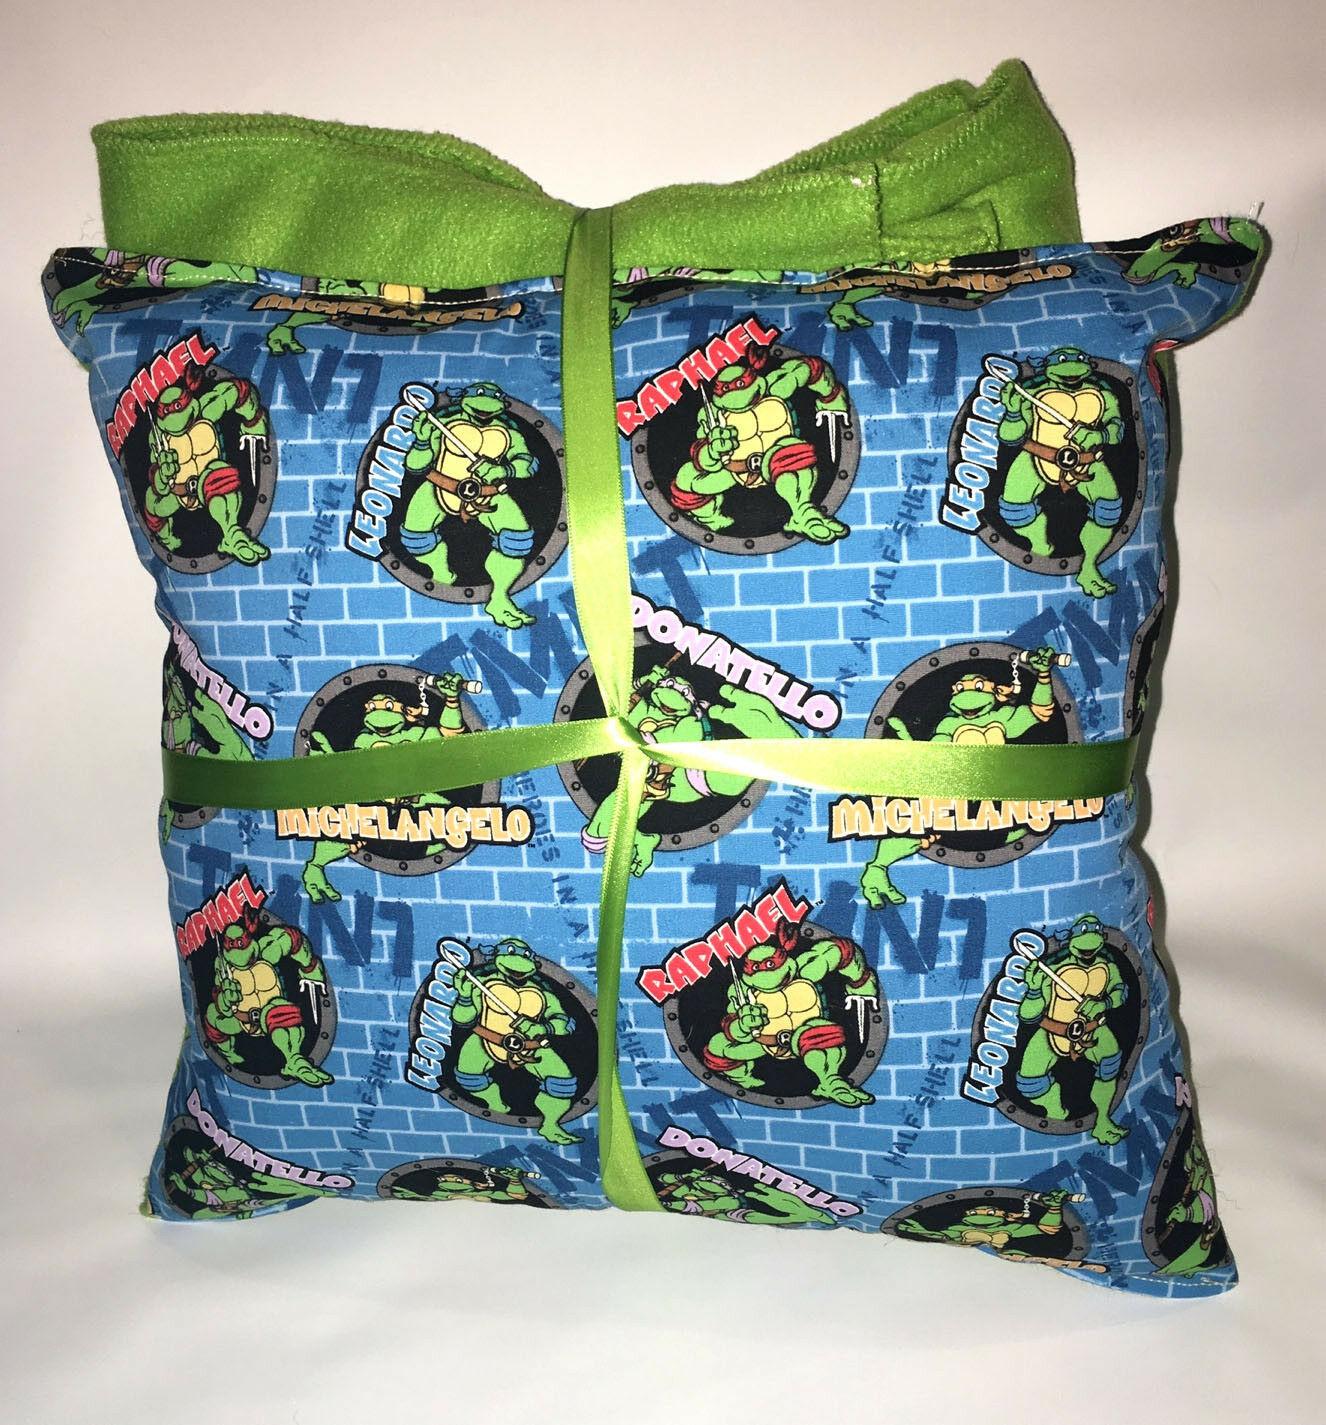 TMNT Pillow And Blanket Teenage Mutant Ninja Turtle Wall Pillow and Blanket Set